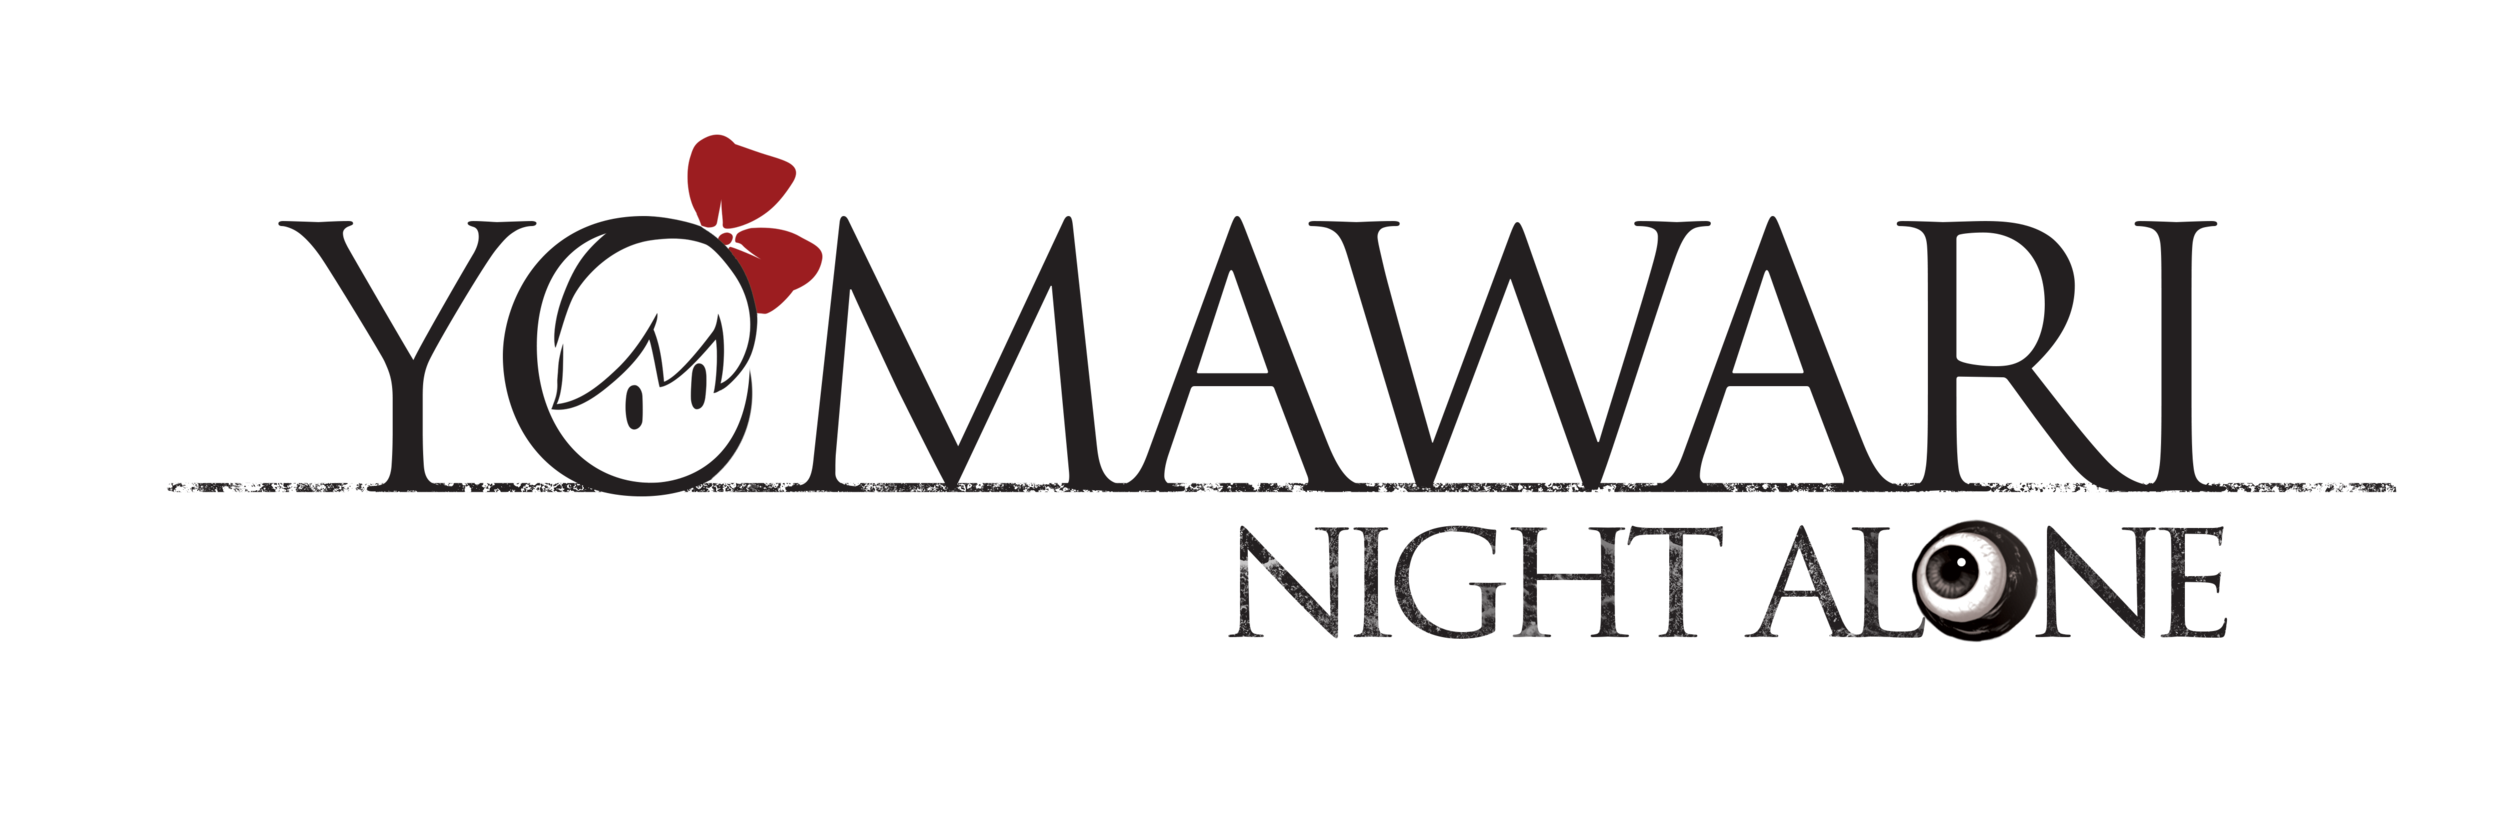 Yomawari_ALT-logo.png